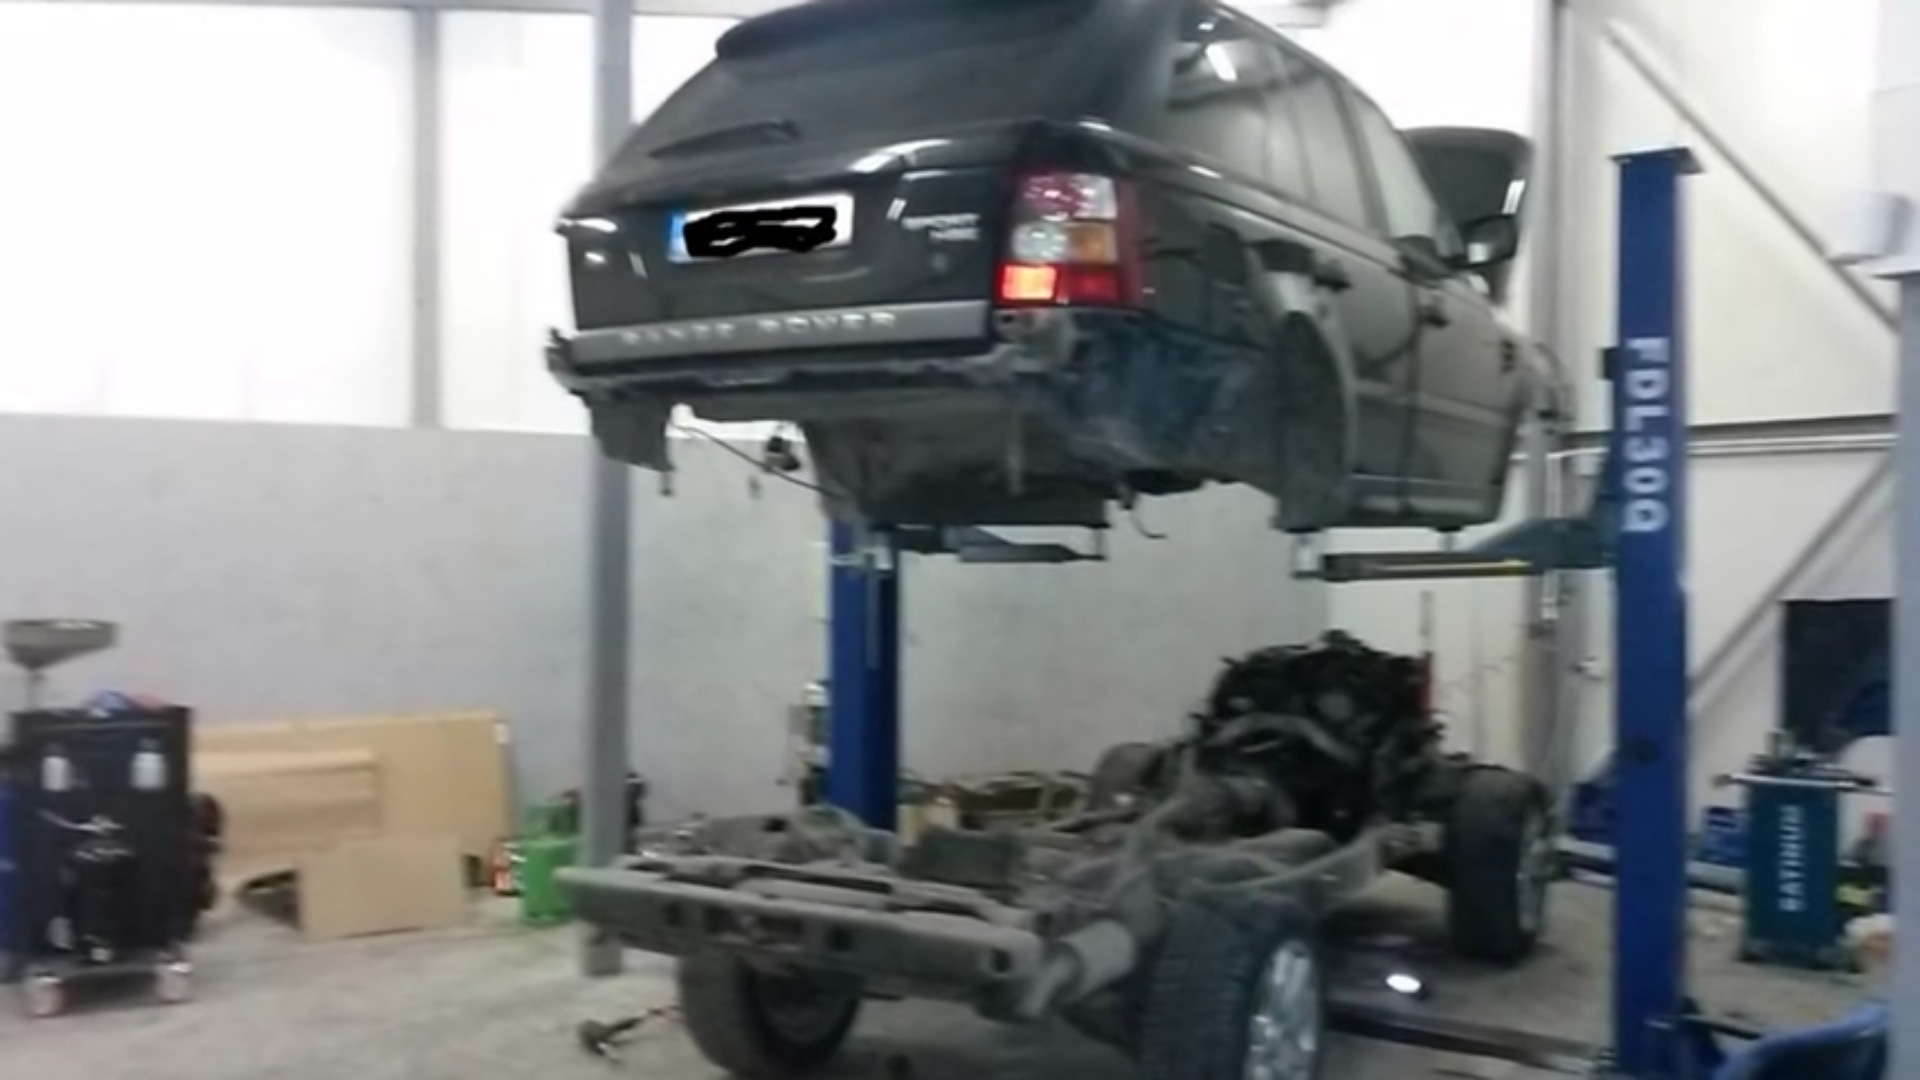 Range Rover Sport Split In Half By Mechanics Just To